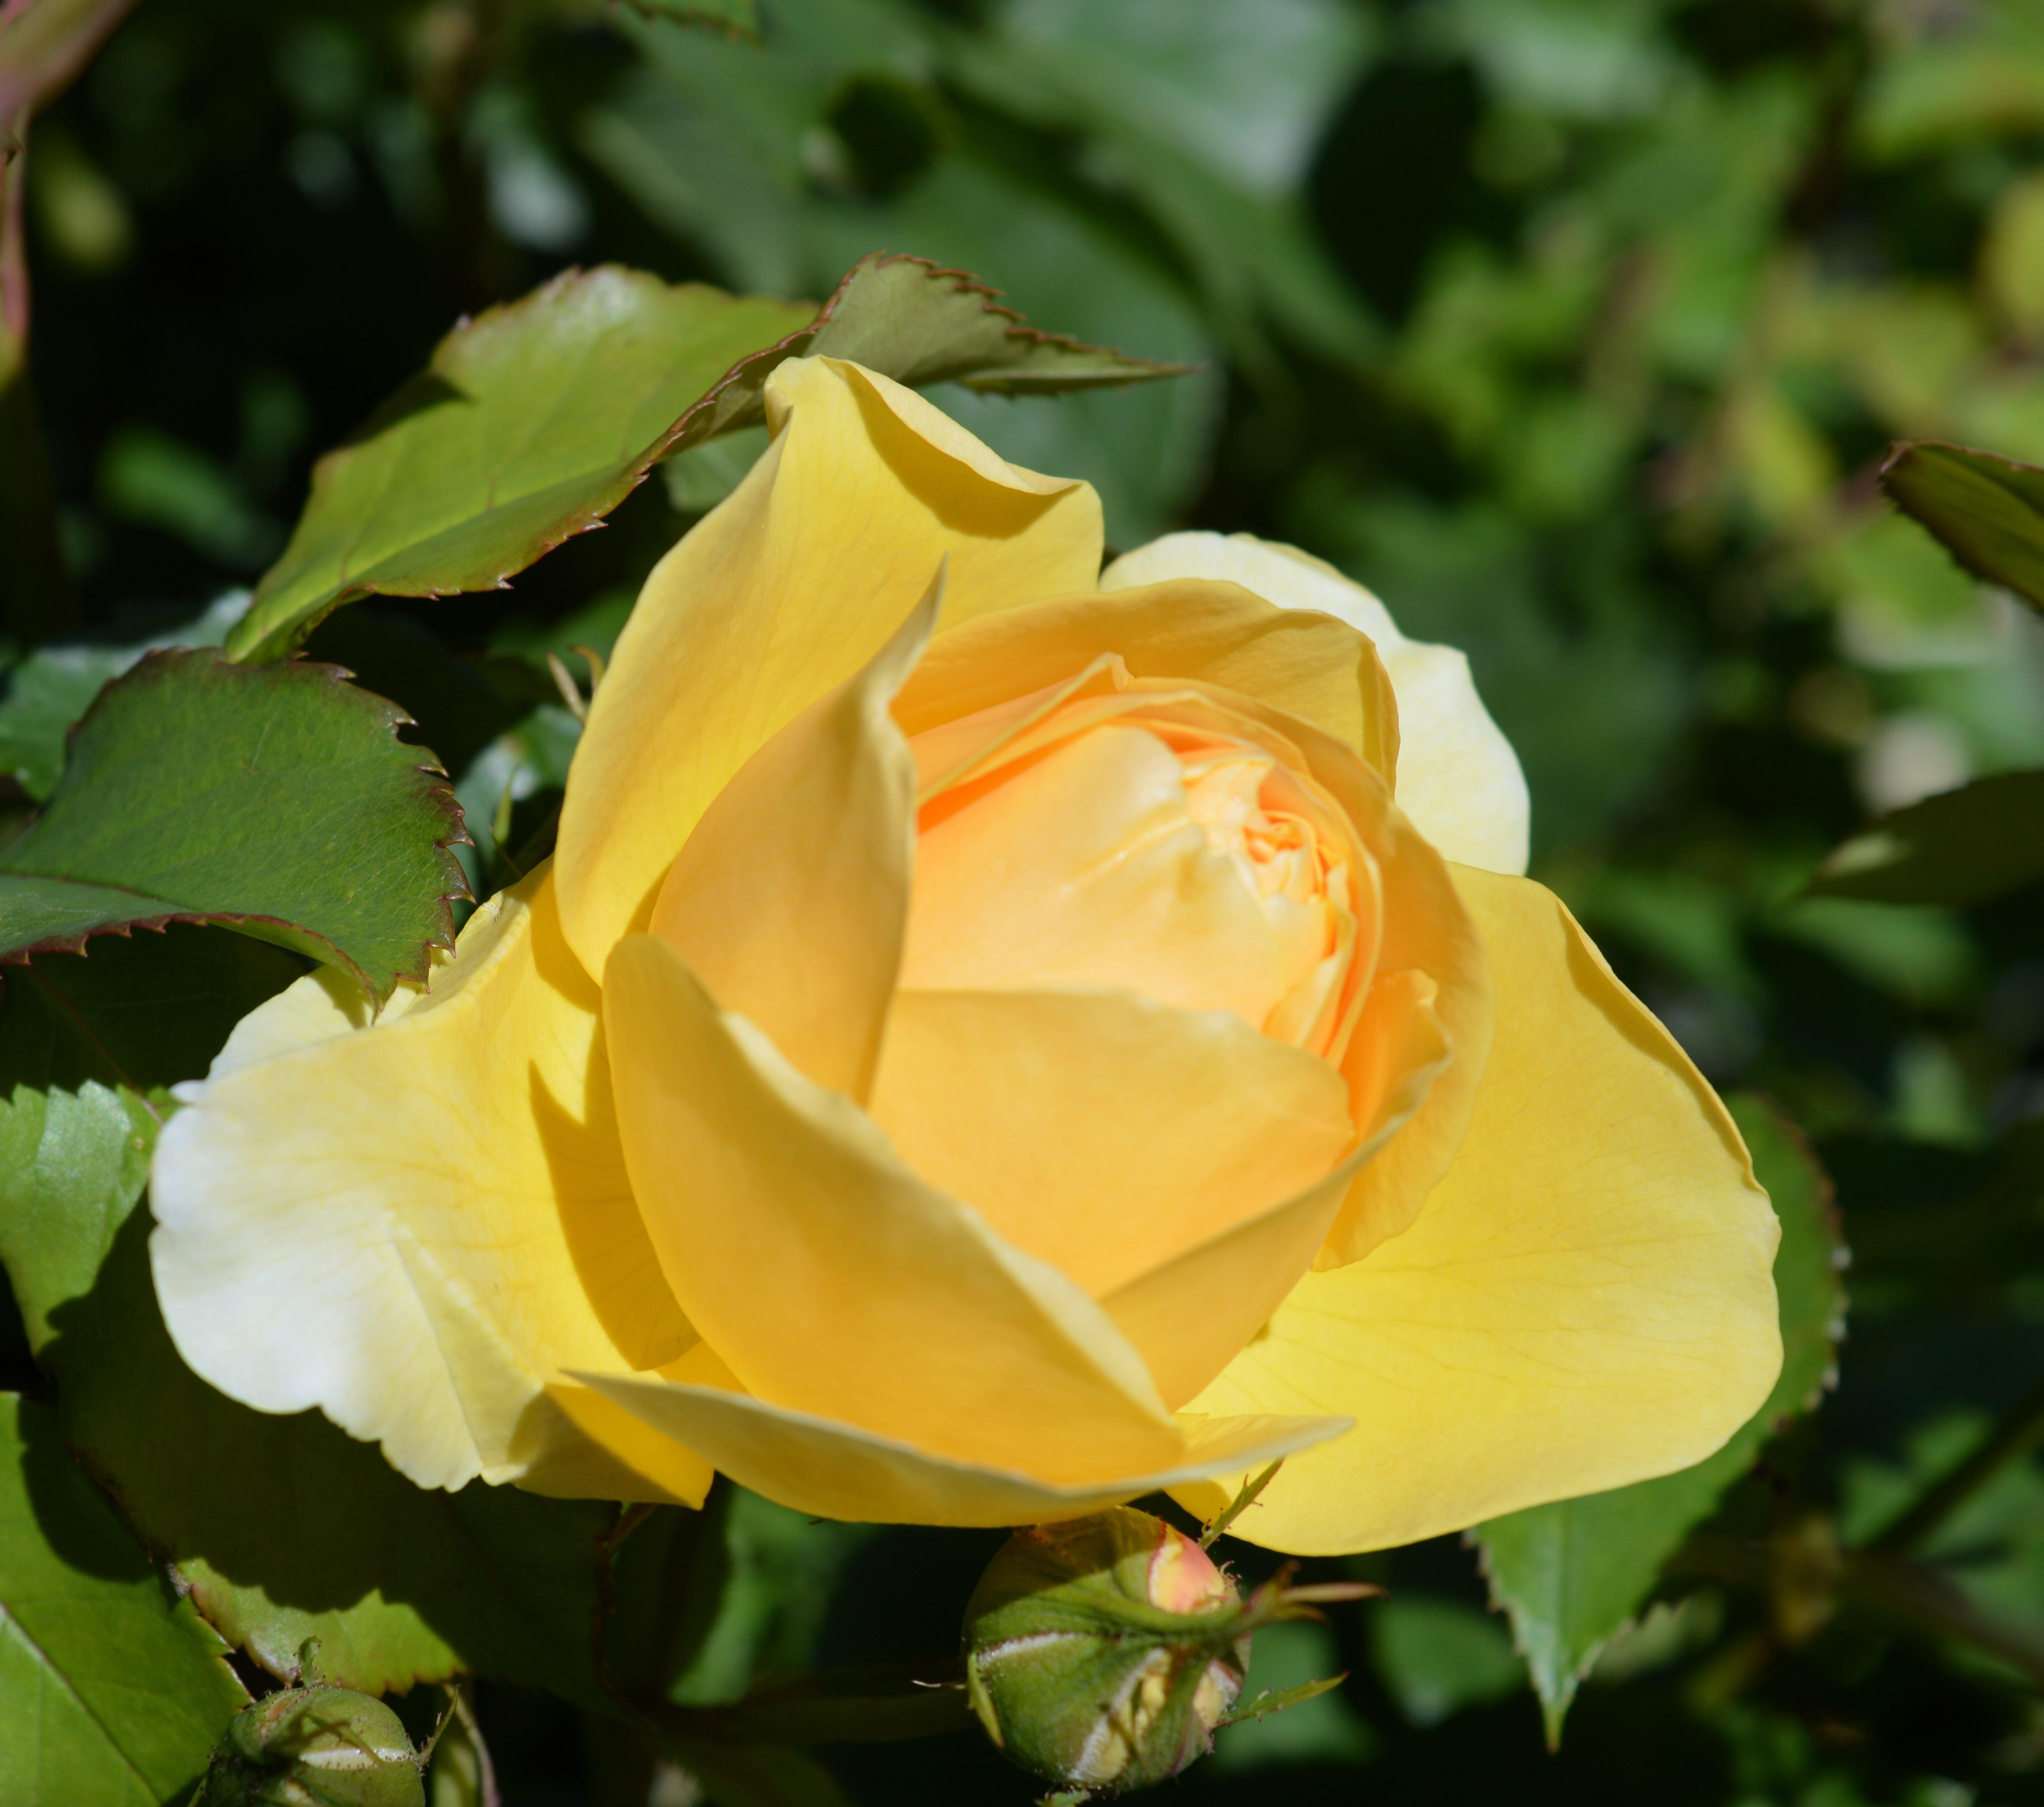 Free Images Nature Blossom Petal Romantic Botany Close Flora